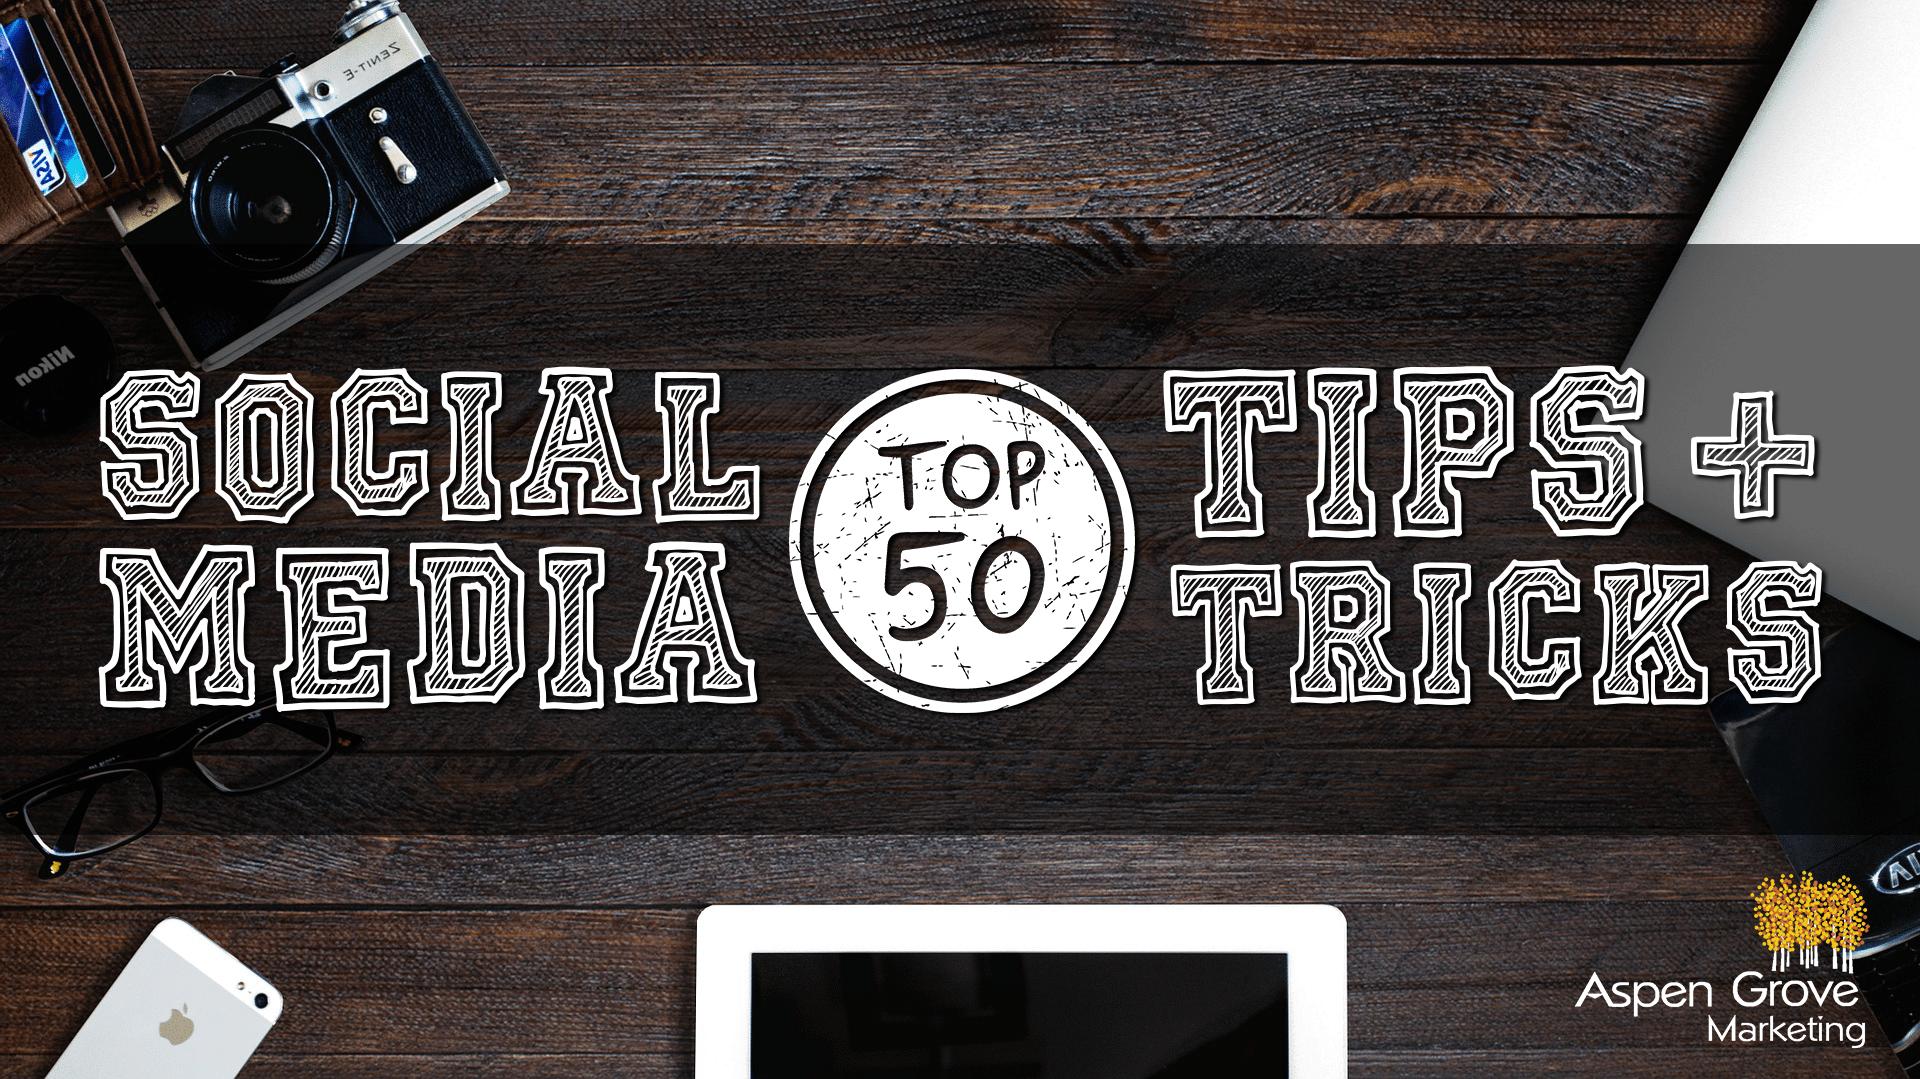 Aspen Grove Marketing's Top 50+ Social Media Tips + Tricks